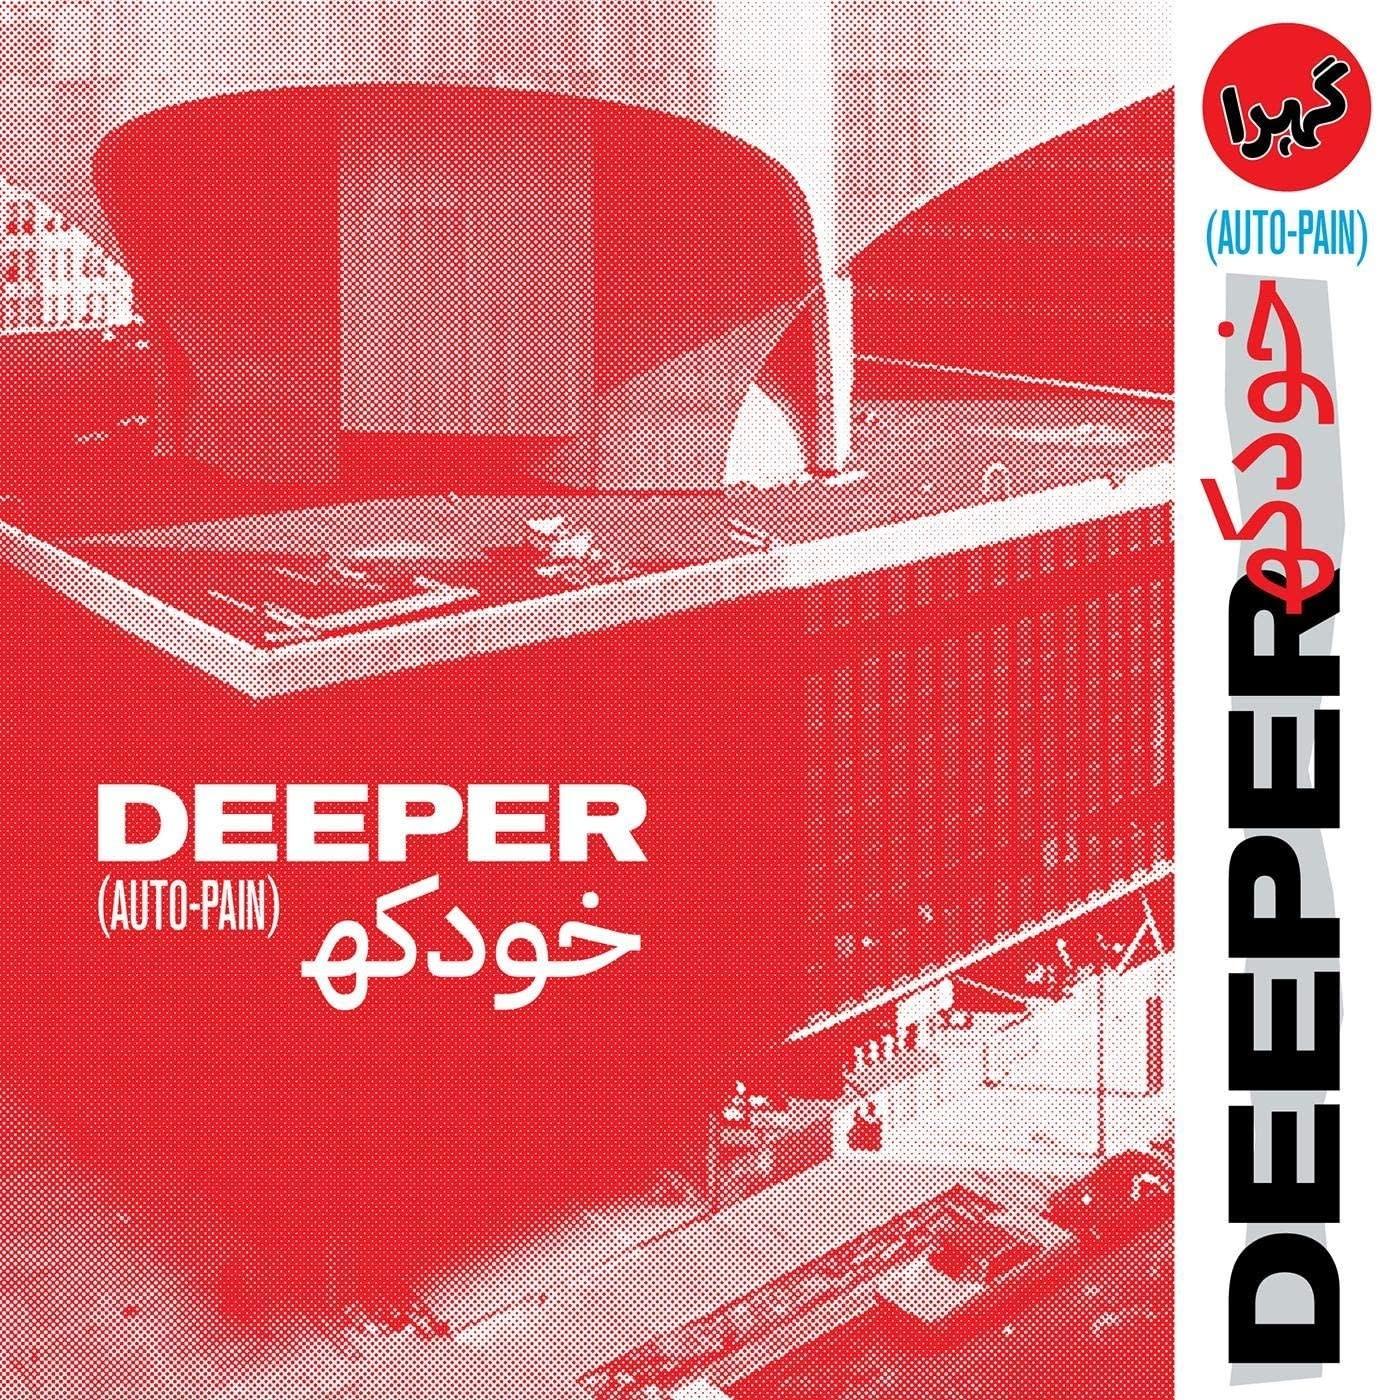 Deeper – Auto-Pain